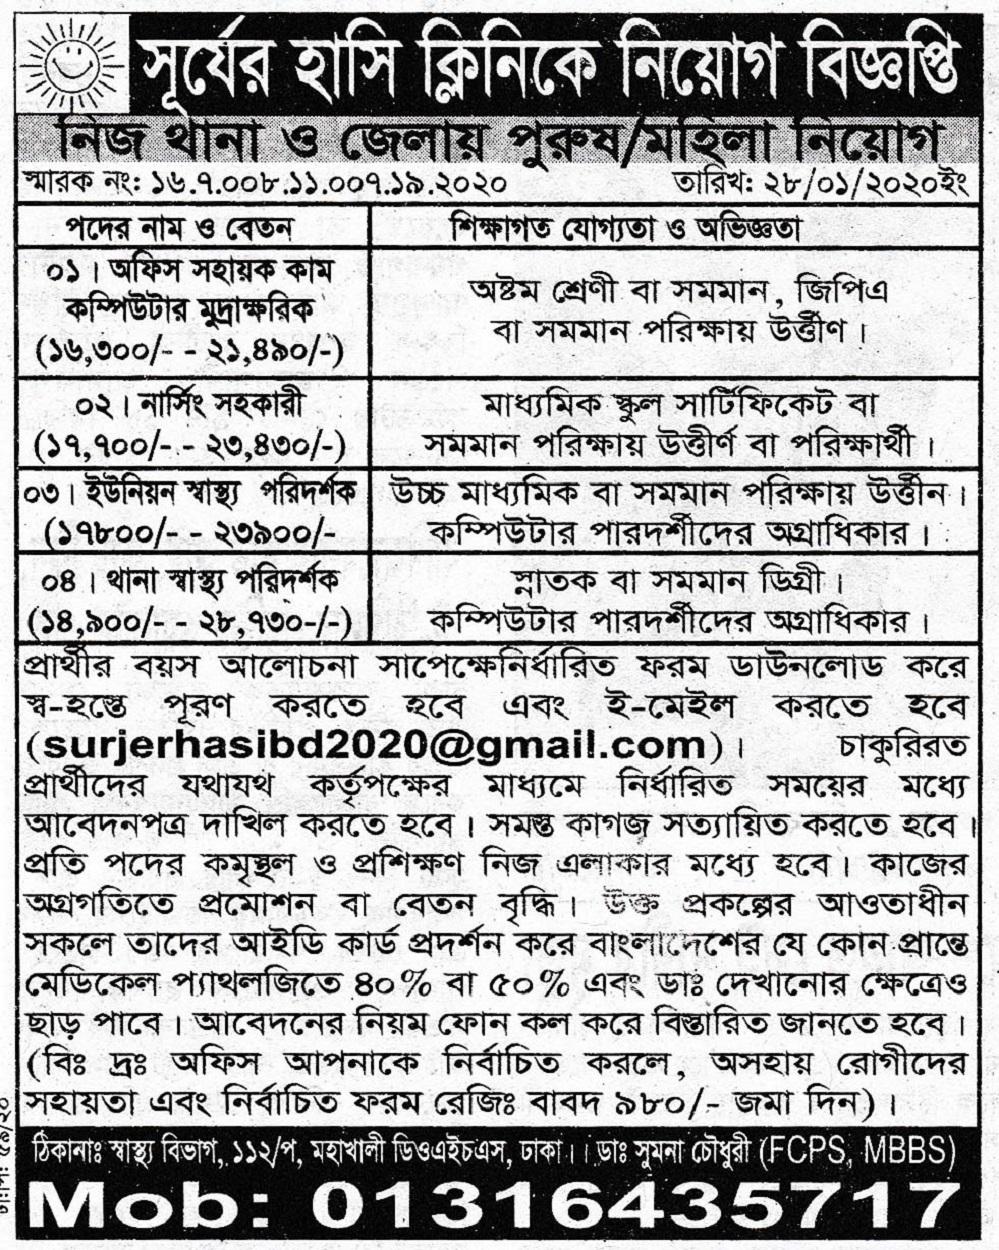 Surjer Hashi Clinic Job Circular 2020